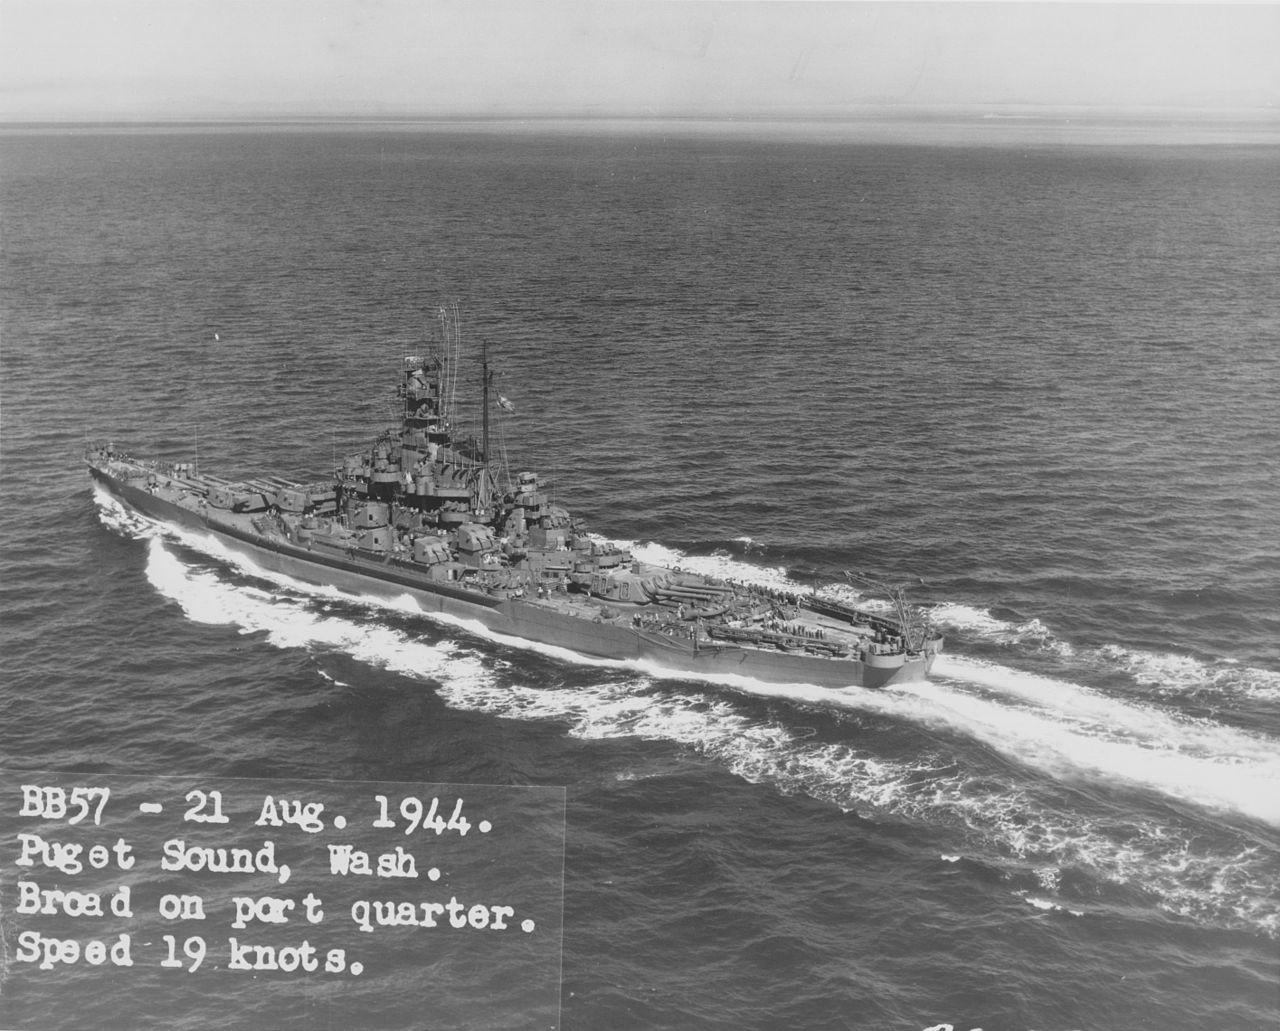 USS_South_Dakota_in_Puget_Sound_NARA_BS_